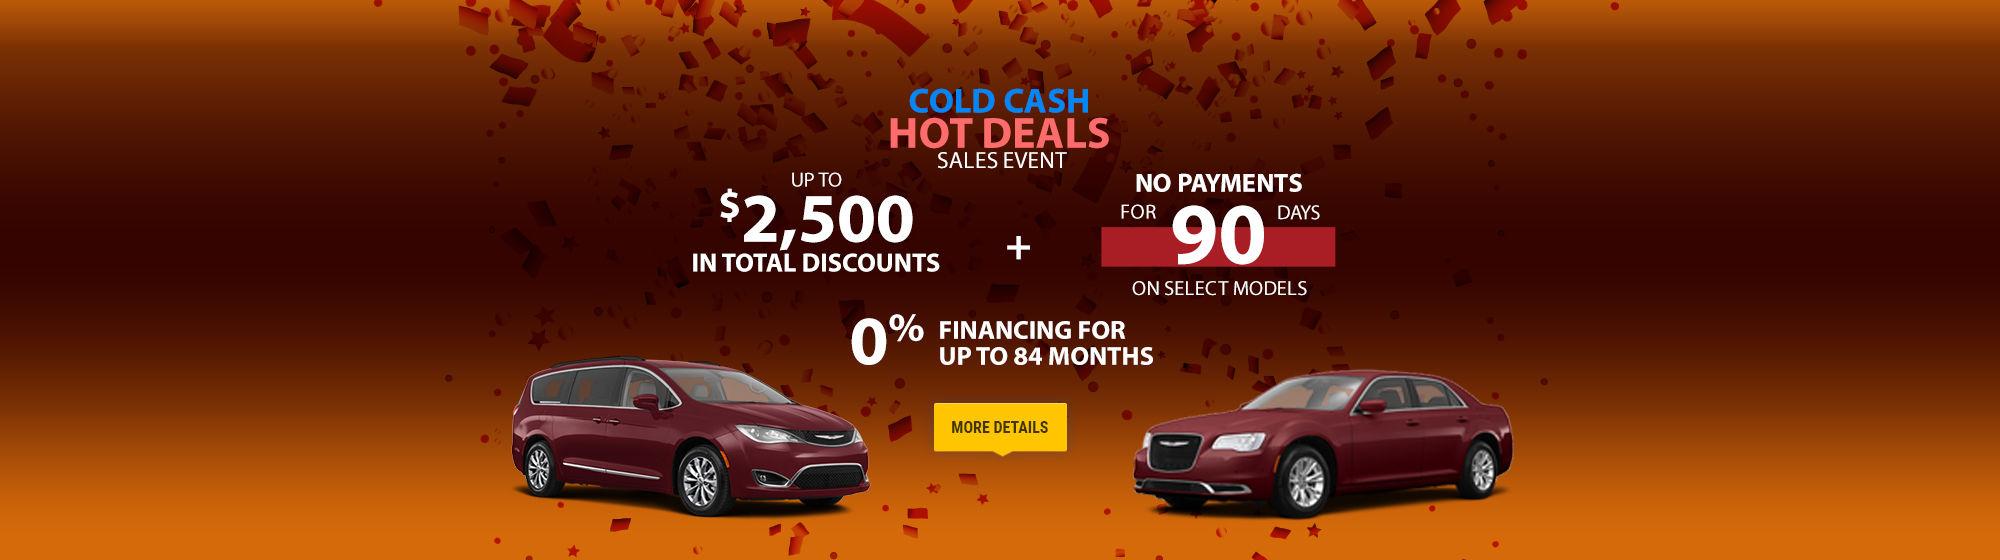 Promotions Amherst Chrysler February